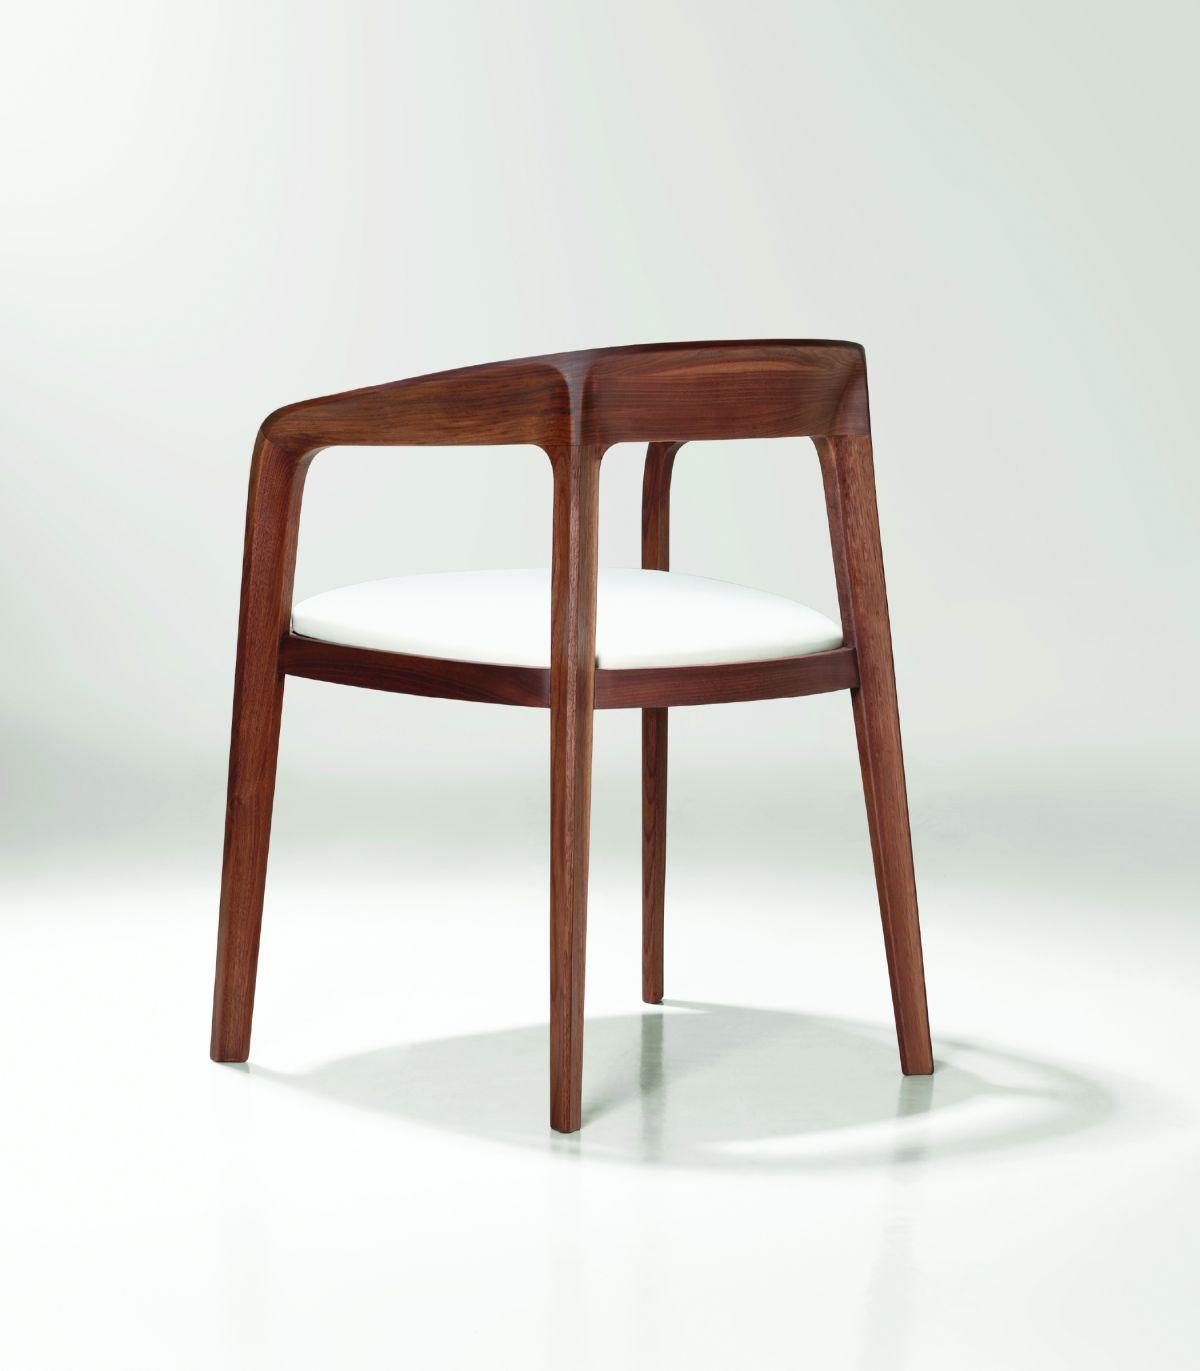 The Corvo Chair by Noé Duchaufour-Lawrance | KARMATRENDZ